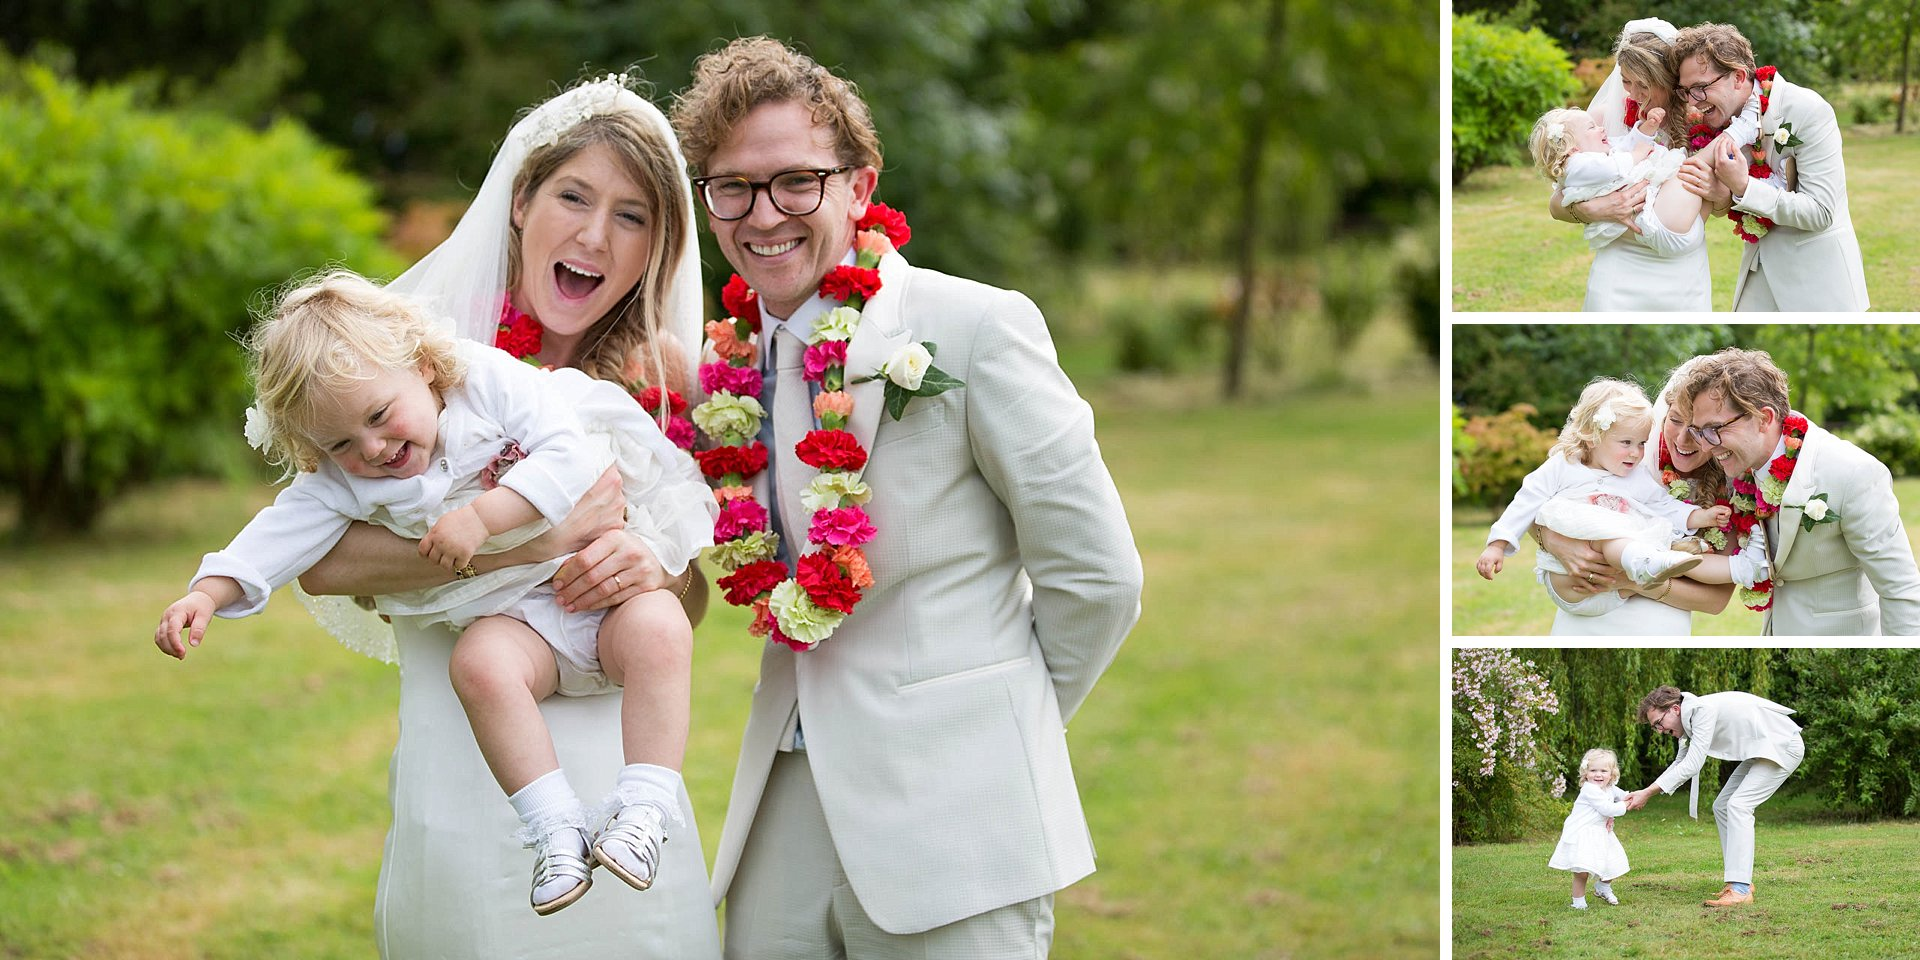 Family fun at wedding